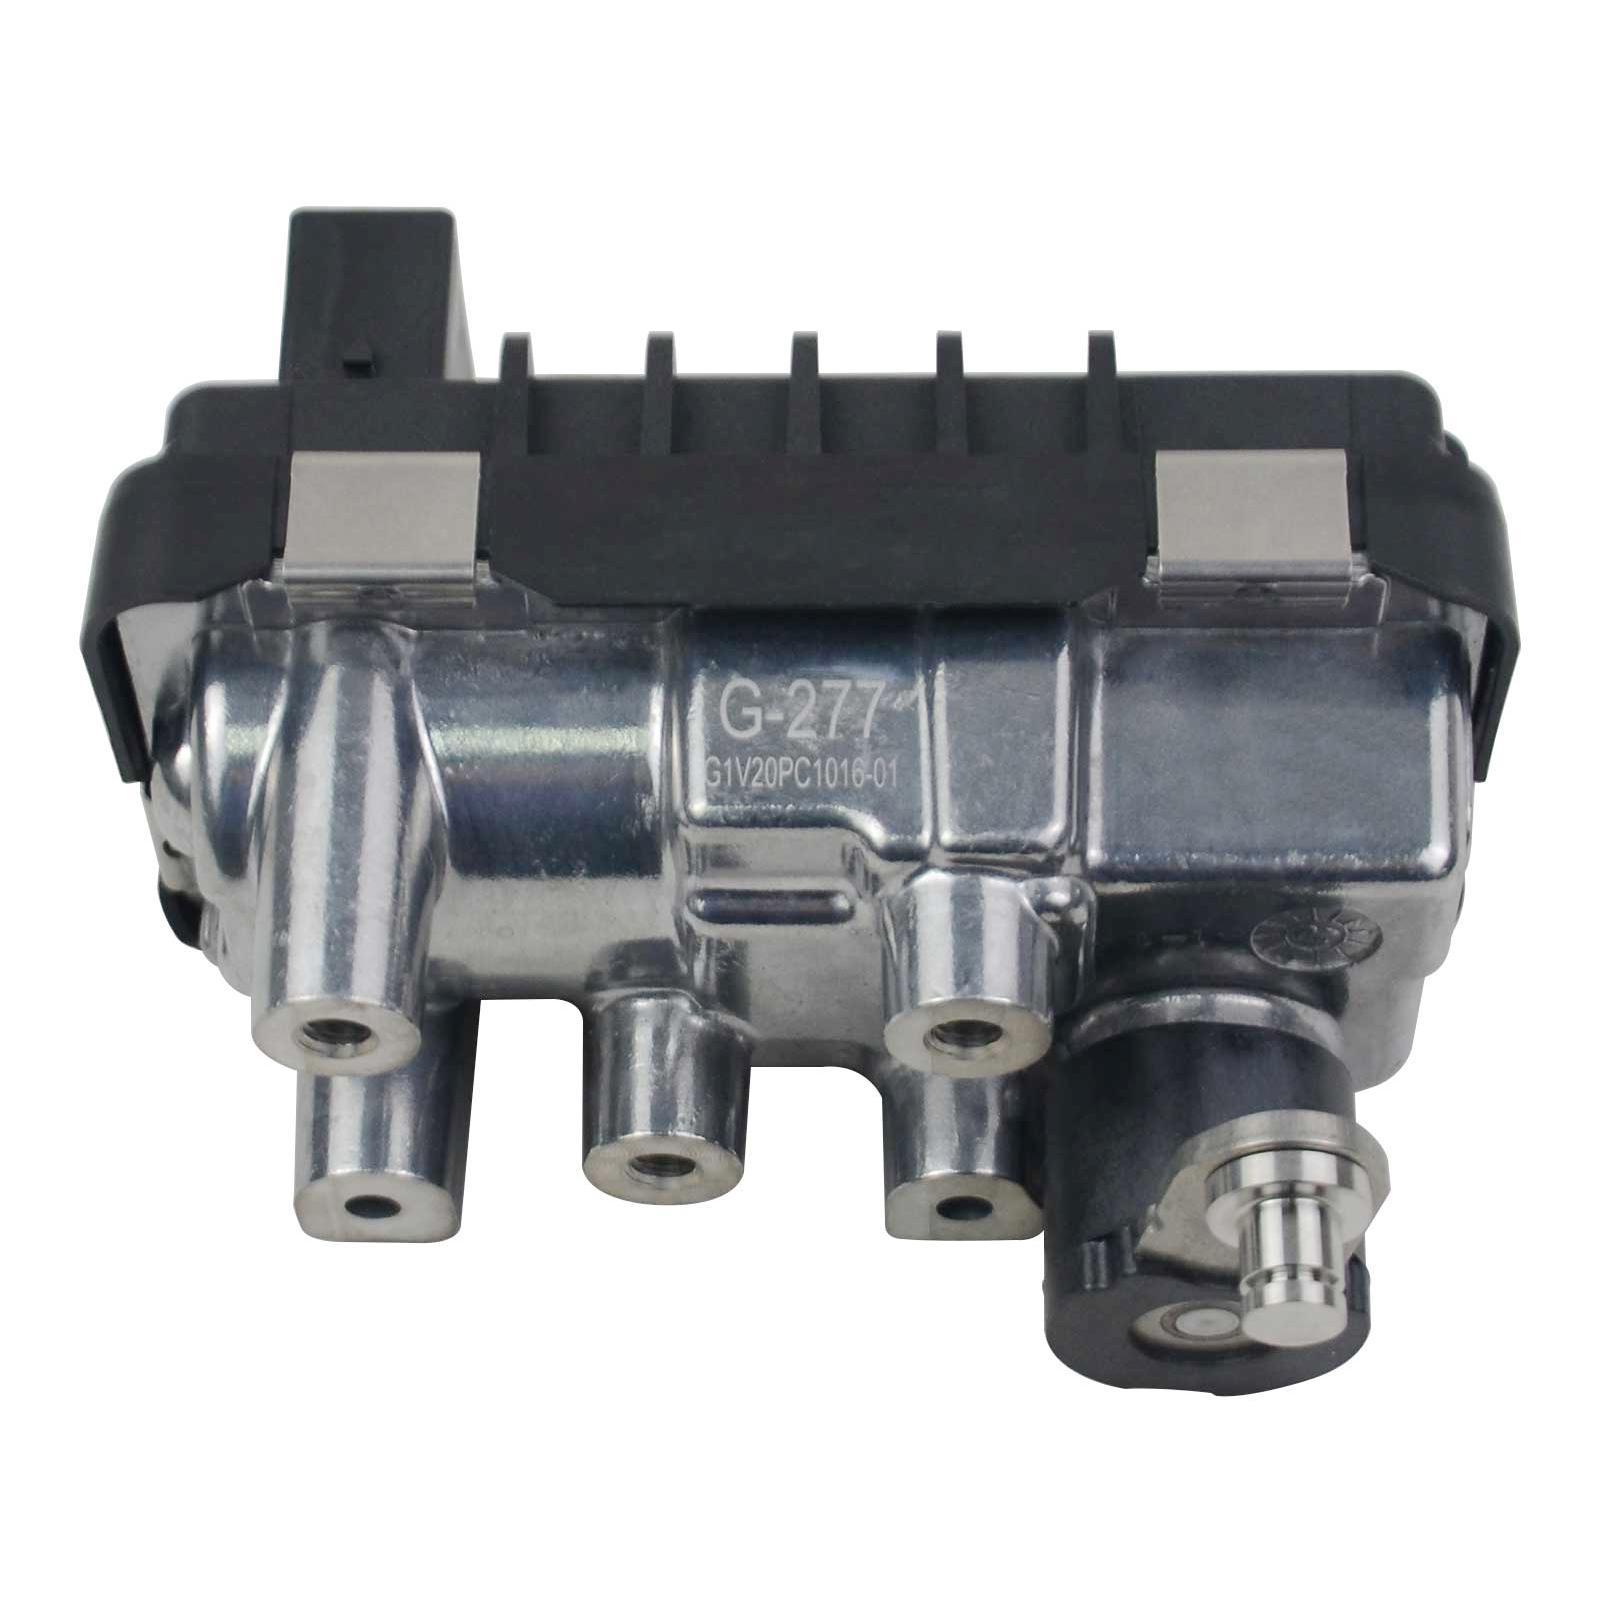 AP02 турбонагнетатель электронный привод G-277 G277 G-219 712120 6NW009420 Турбокомпрессор 《 Jeep Cherokee 3.0CRD 160 кВт 218 HP OM642